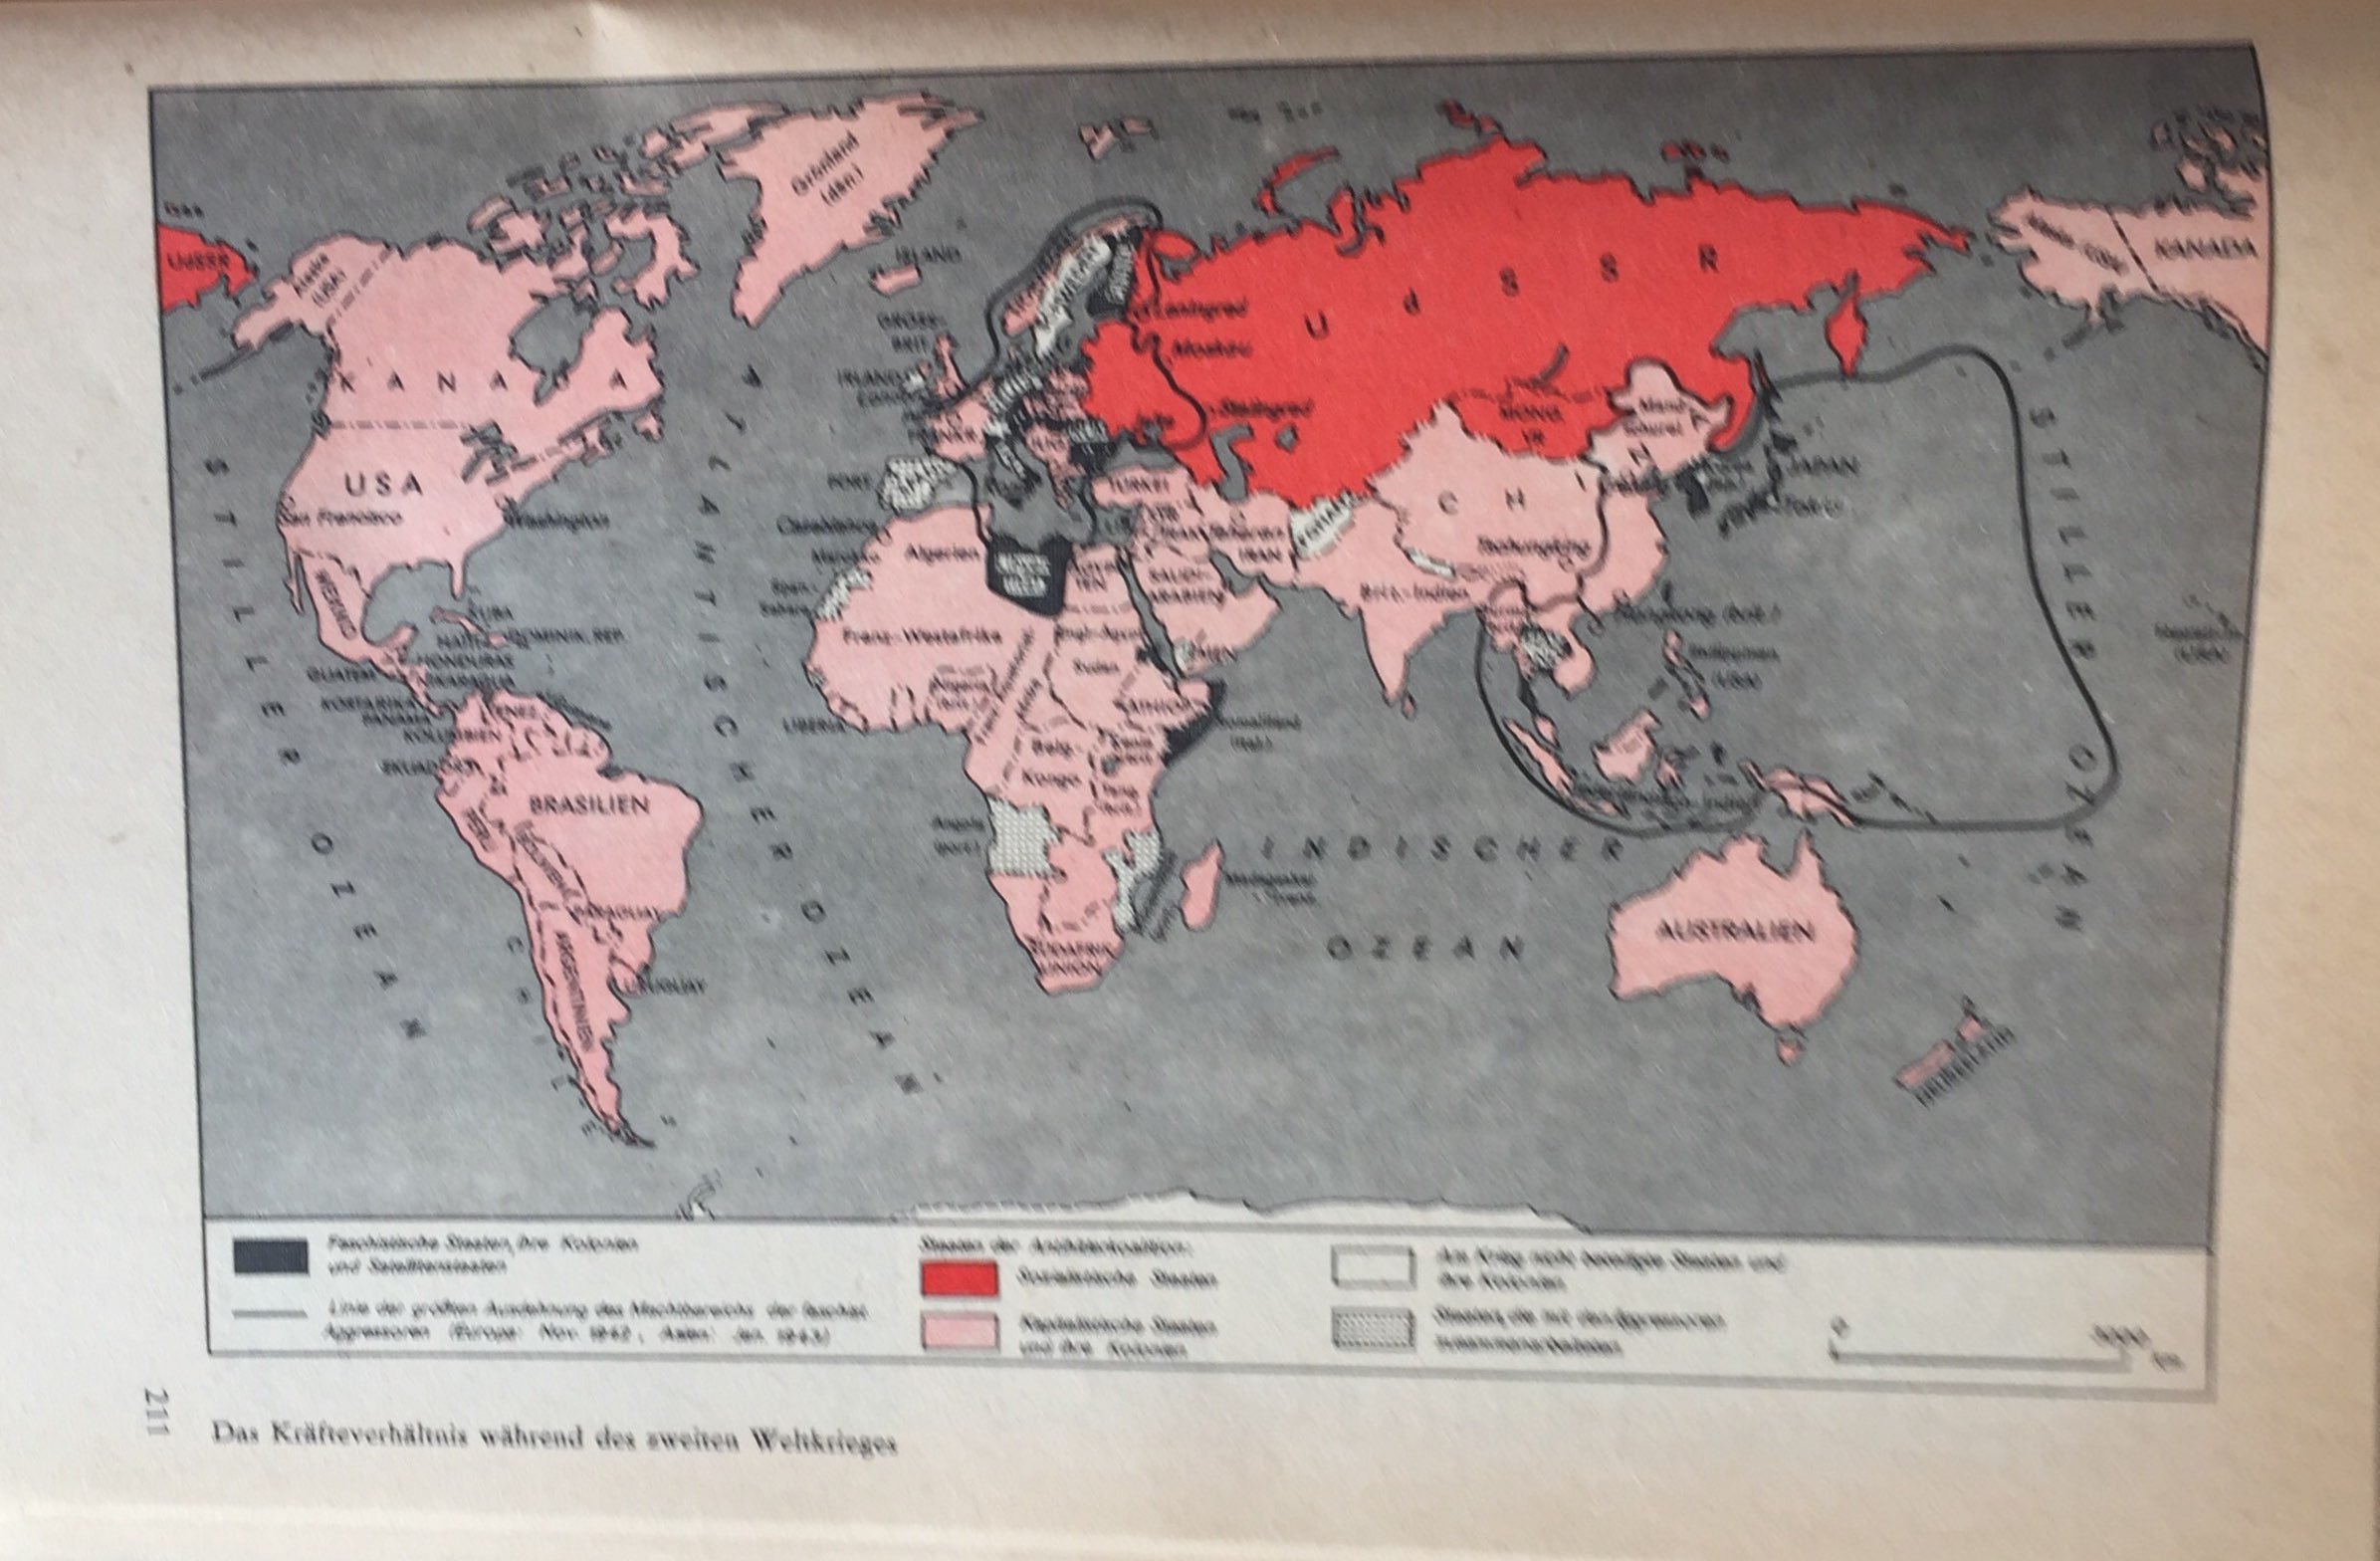 Kräfteverhältnis während des II. Weltkrieges